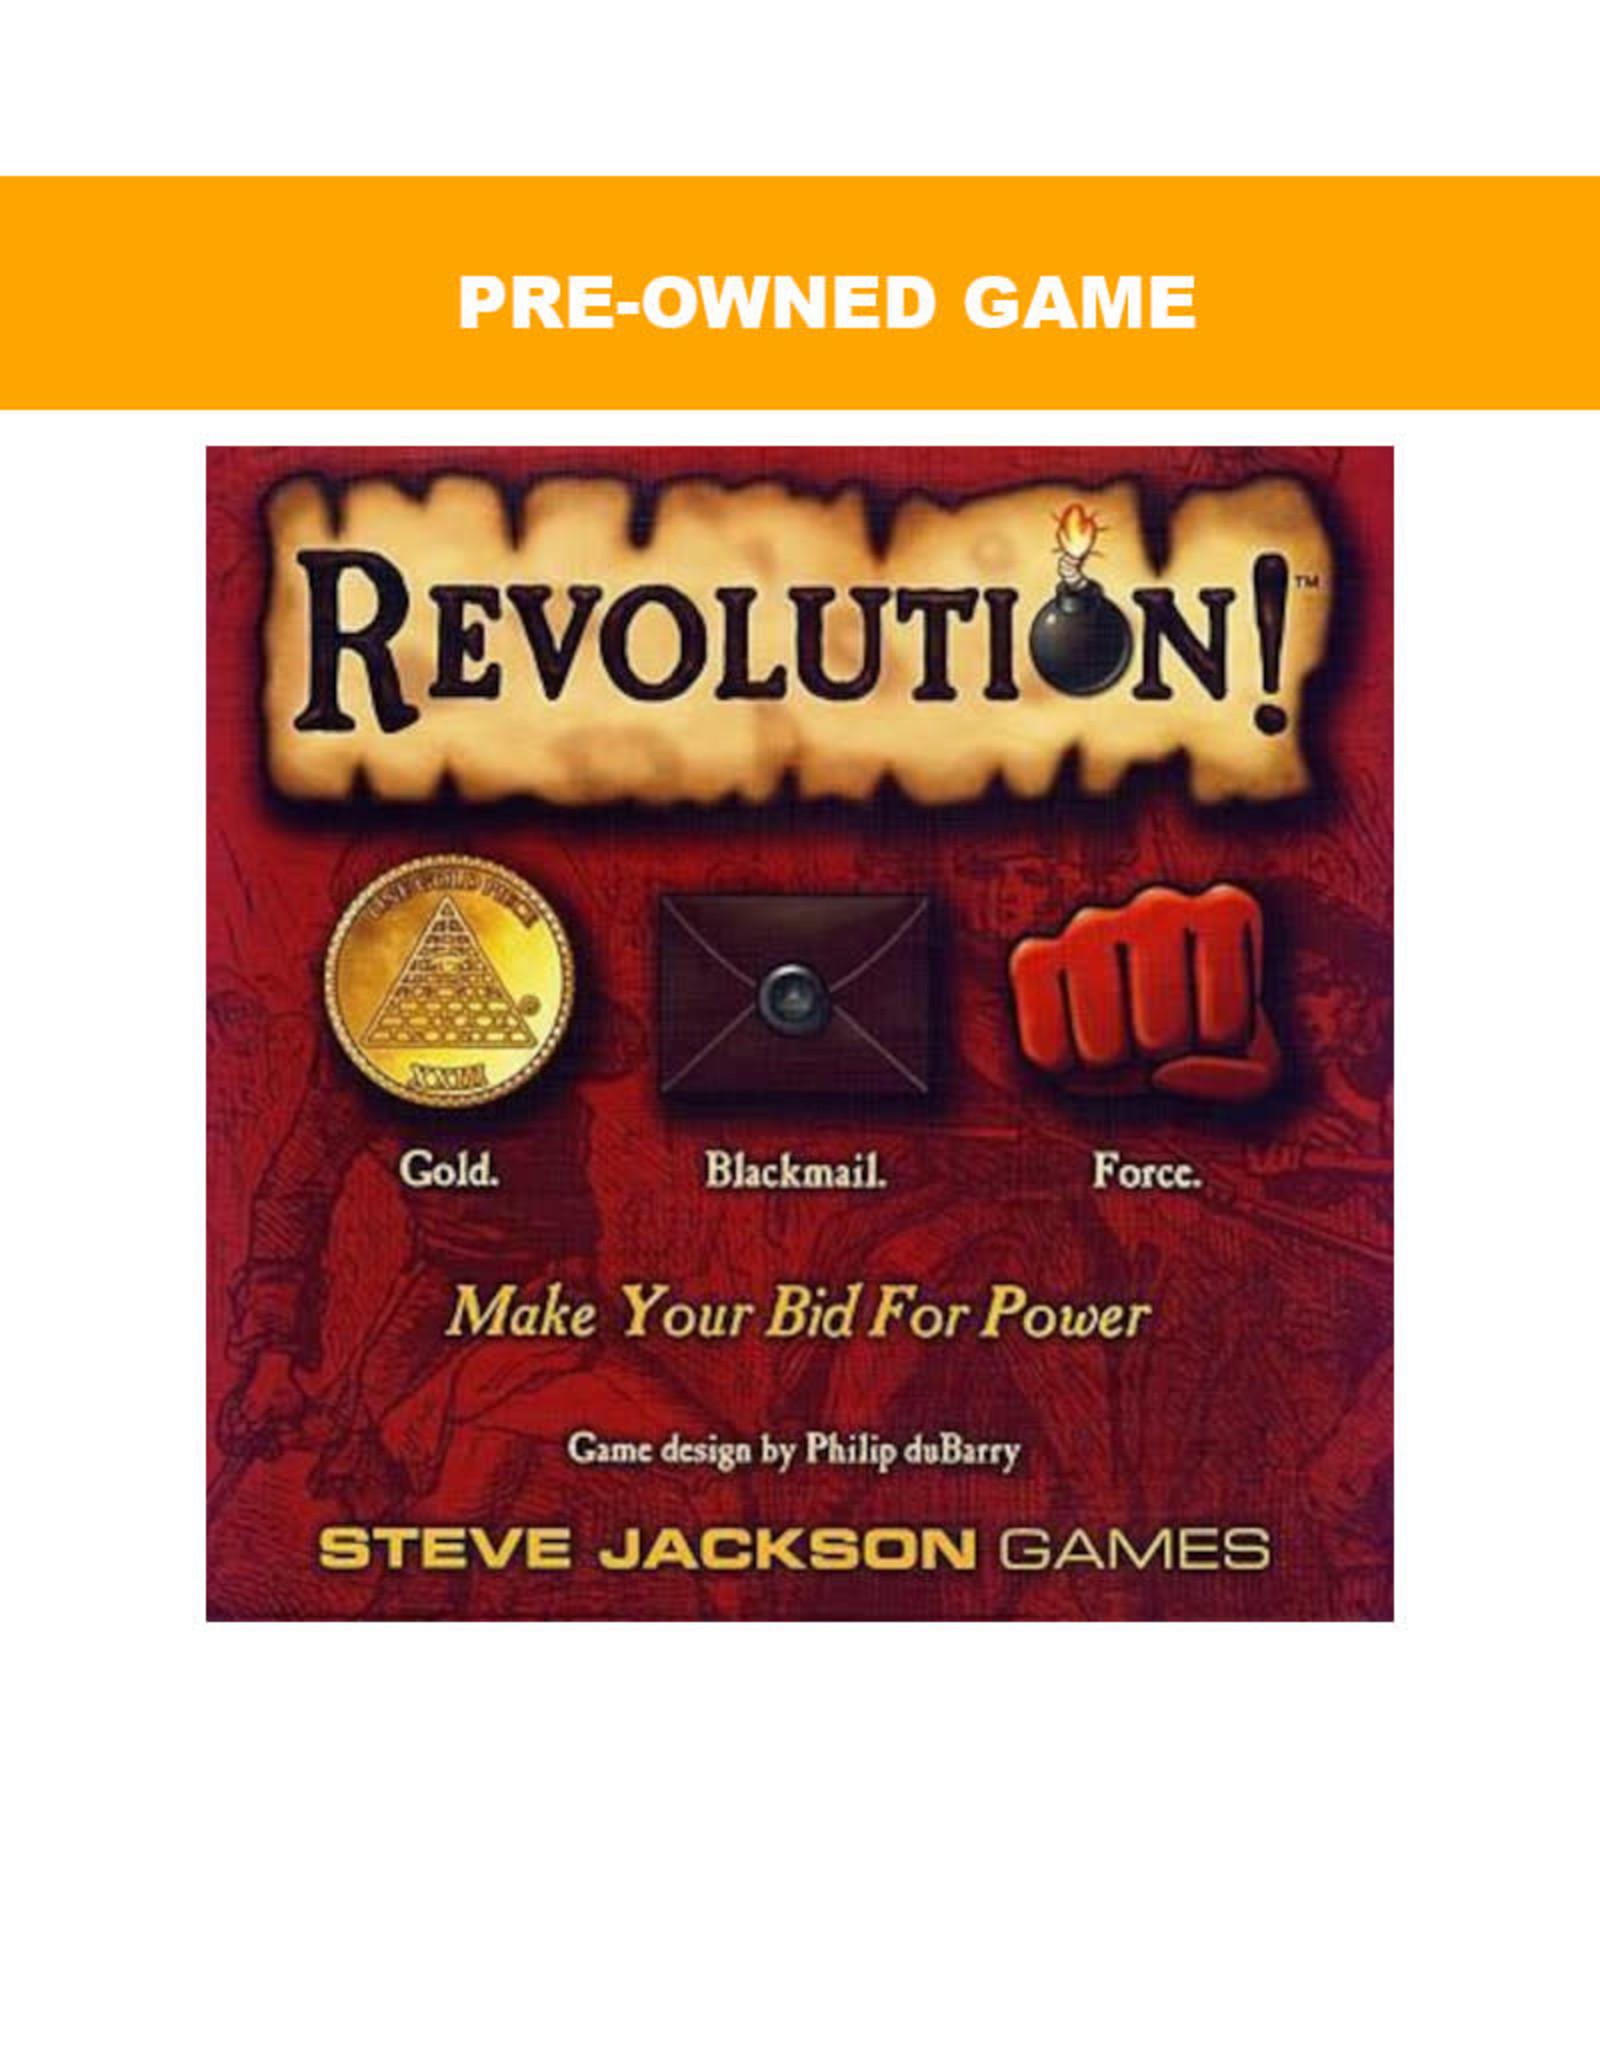 Steve Jackson Games (Pre-Owned Game) Revolution